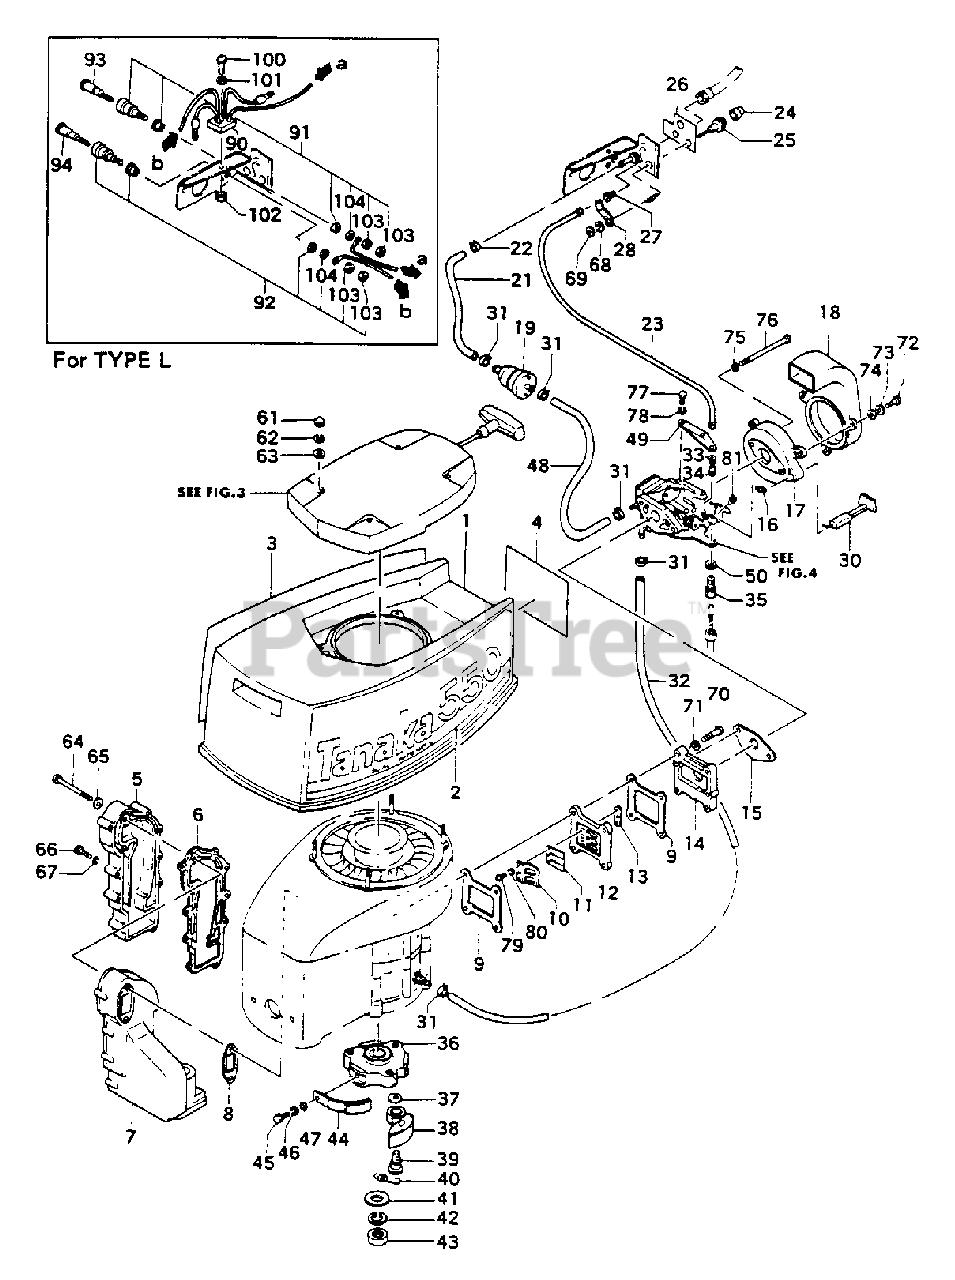 [SCHEMATICS_4JK]  Tanaka TOB-550 - Tanaka 5.5HP Outboard Engine Muffler, Clutch & Reed Valve  Parts Lookup with Diagrams   PartsTree   Outboard Engine Diagram Clutch      PartsTree